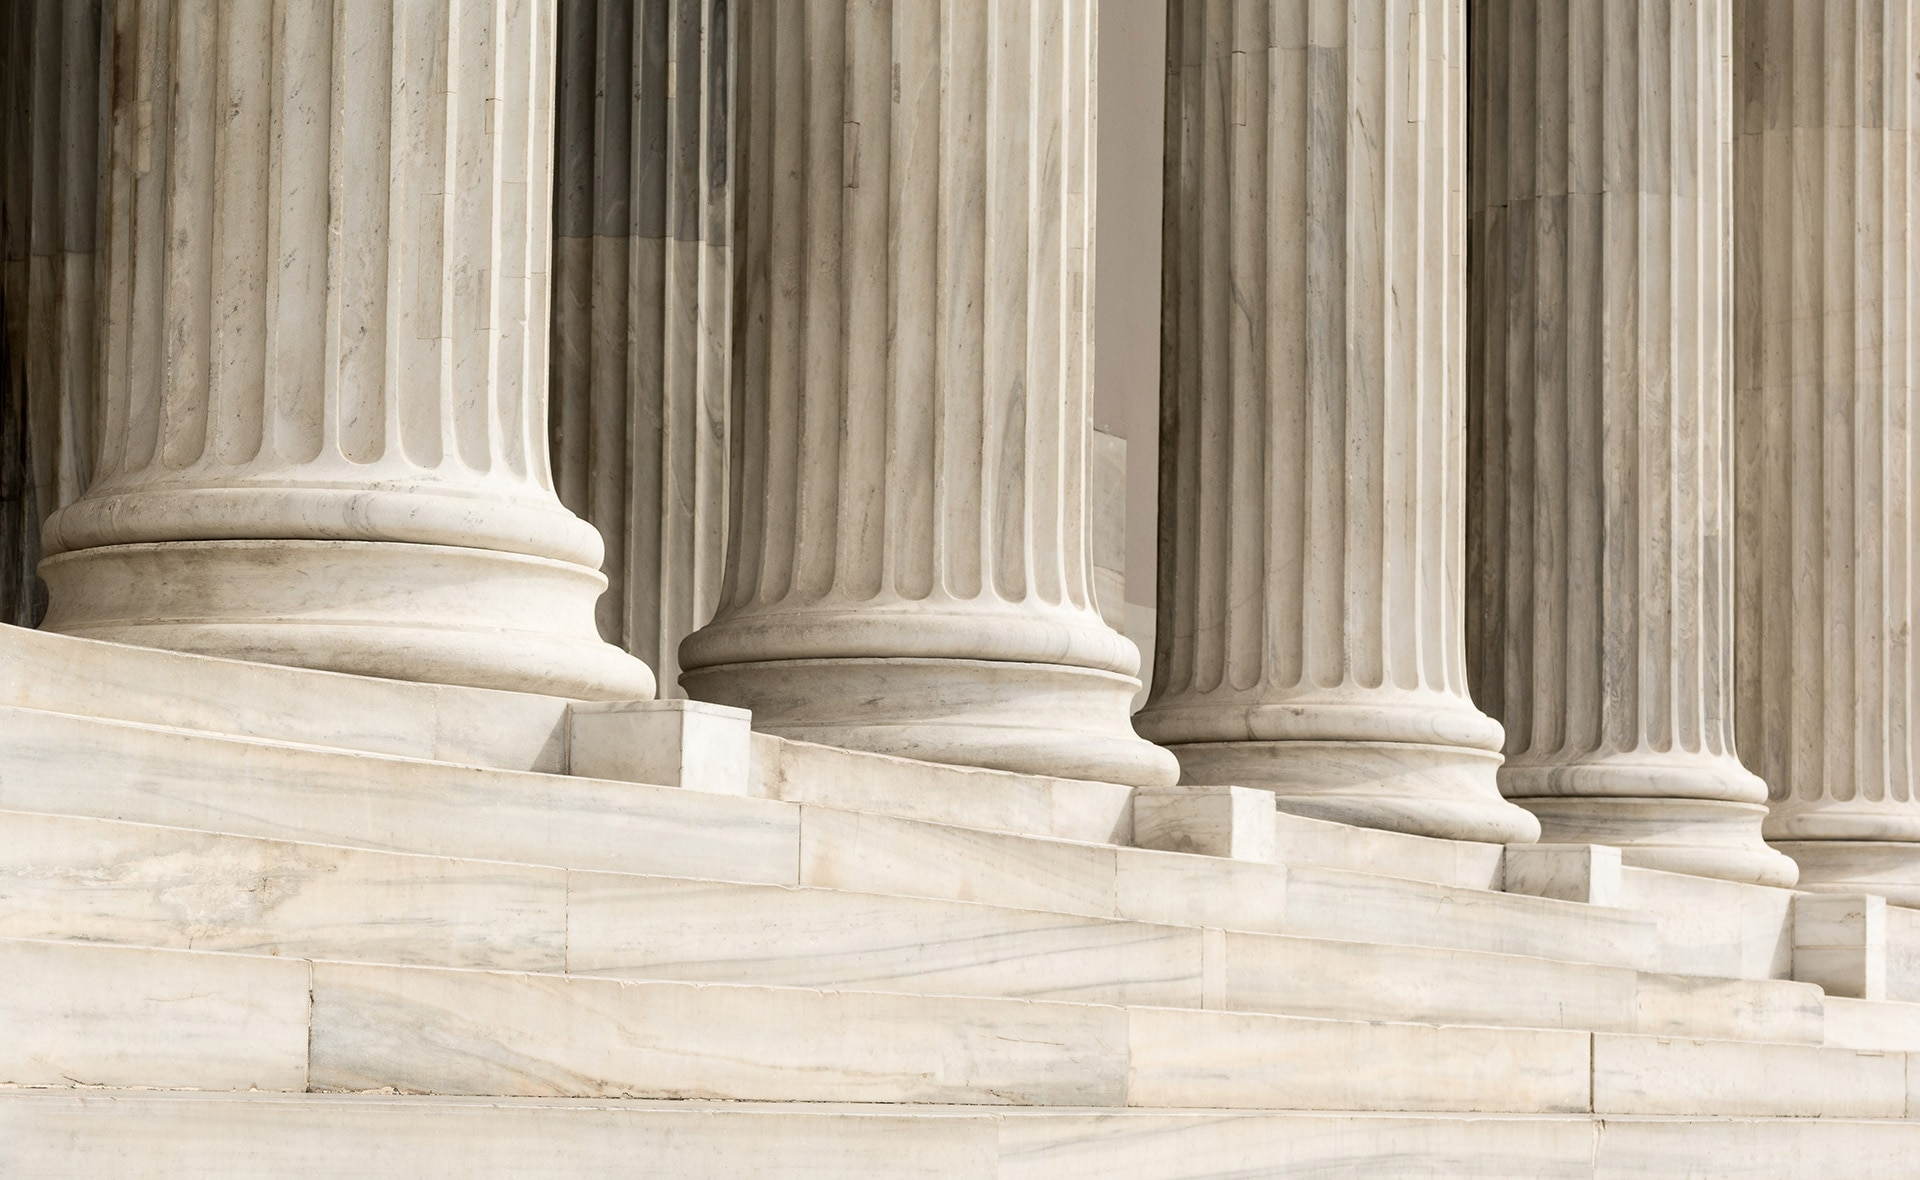 BBVA-cartera-coap-riesgos-columnas-bancos-solidez-eguridad